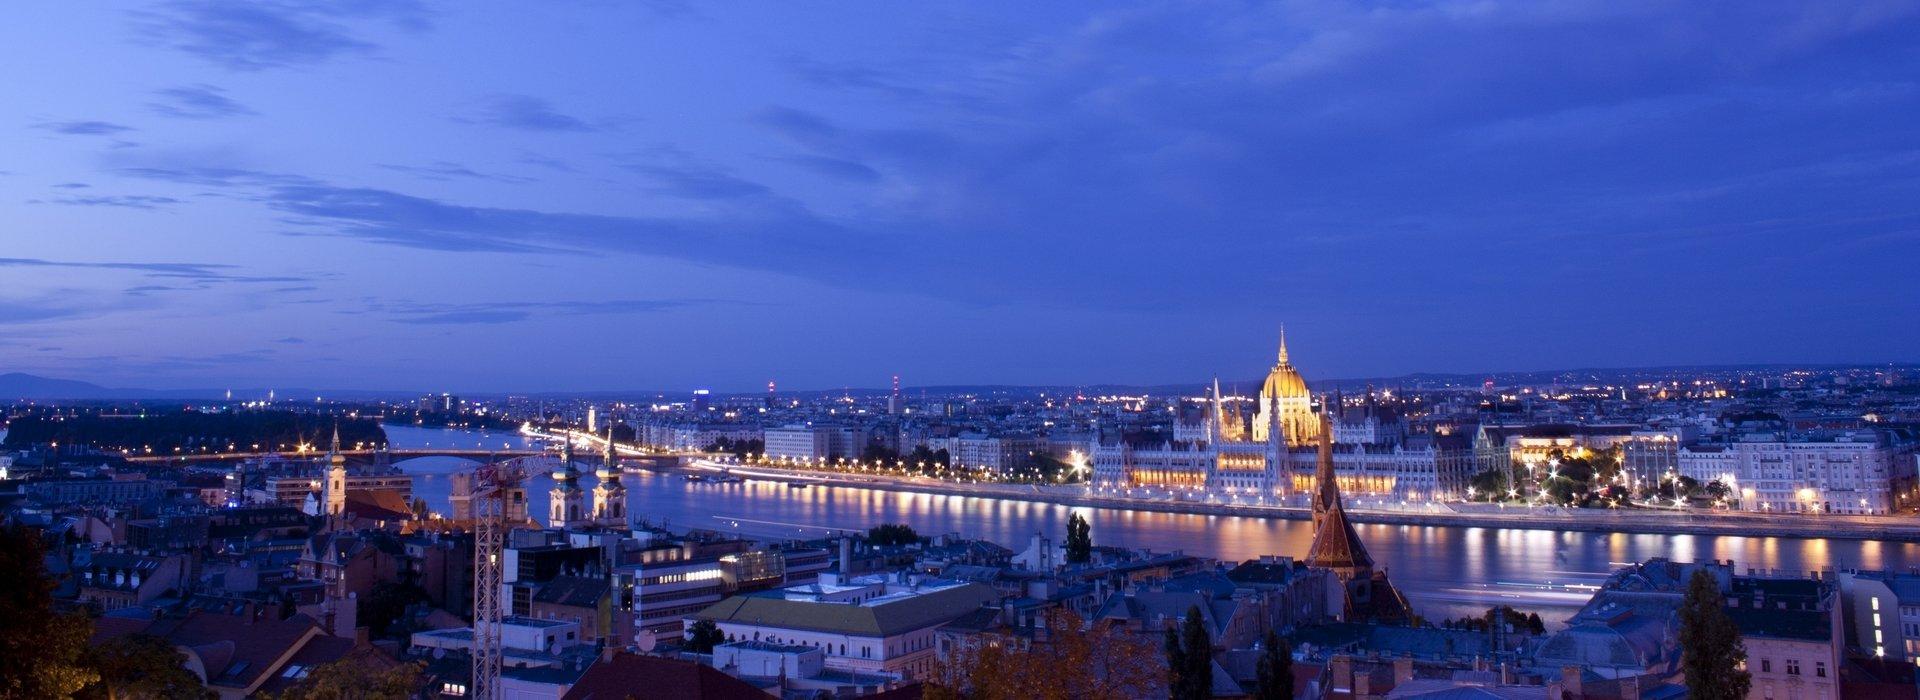 Budapest Általános Információk – Budapest Info